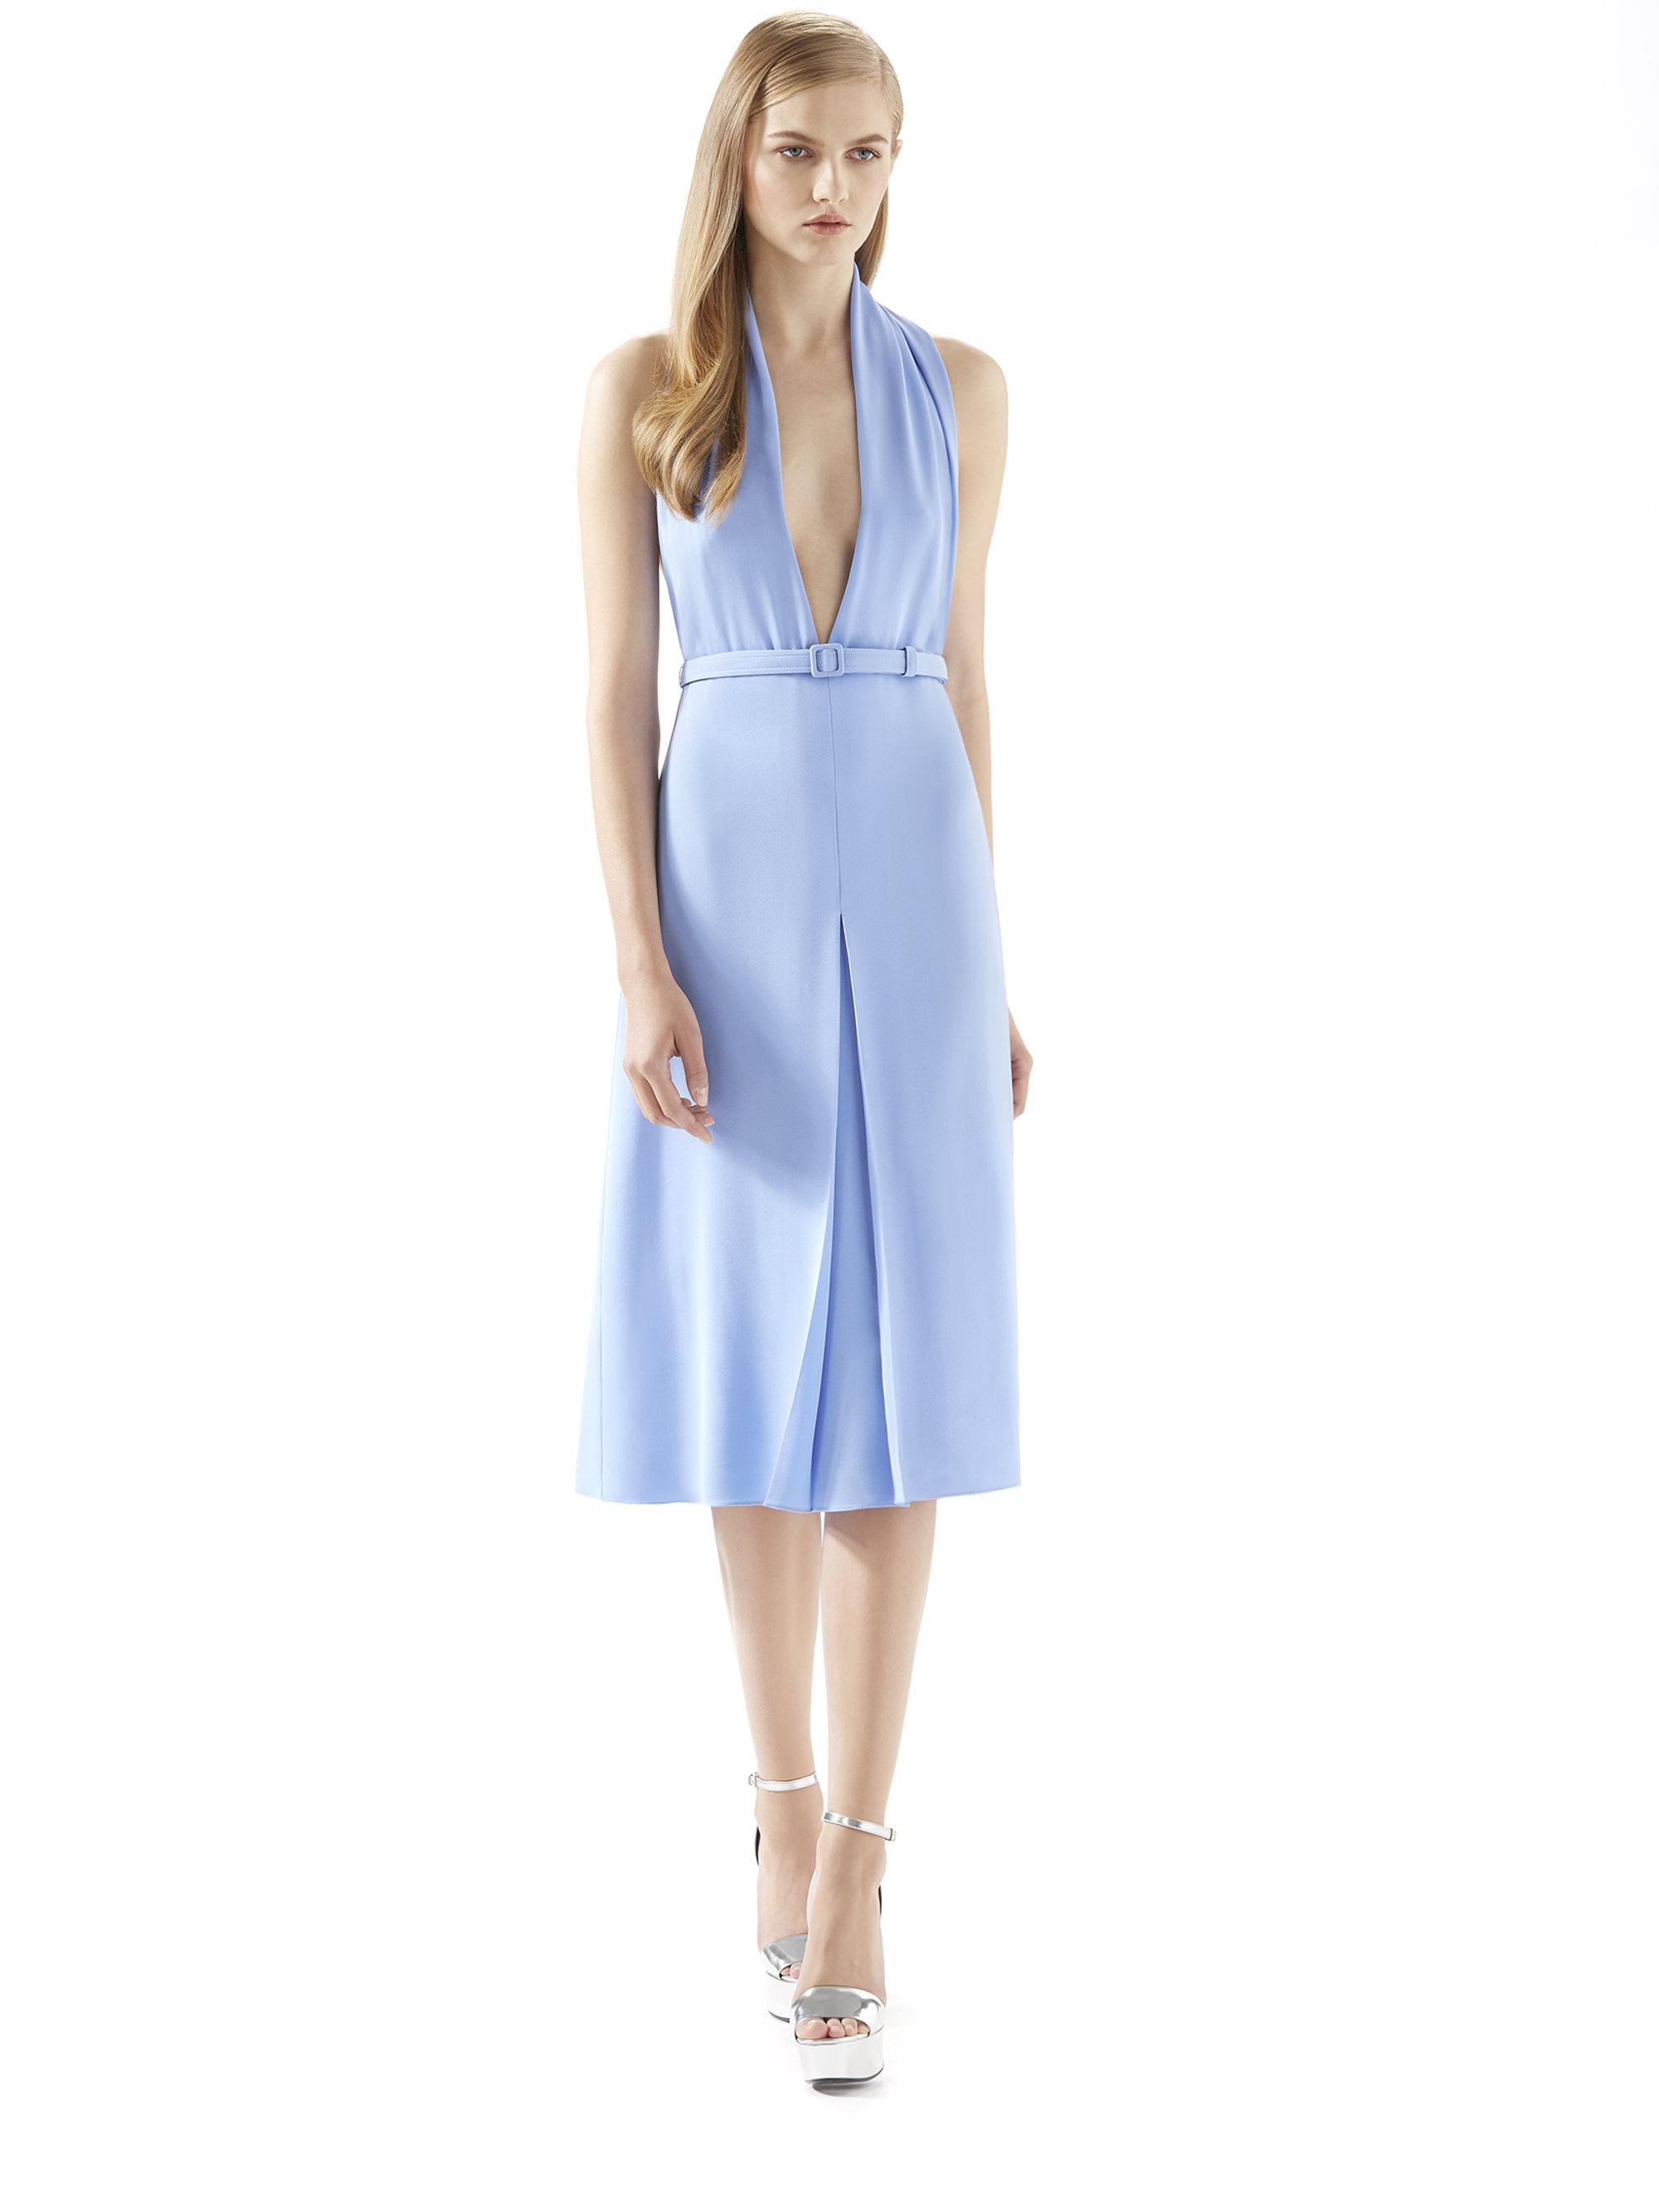 Gucci Light Blue Silk Crepe Dress in Blue | Lyst